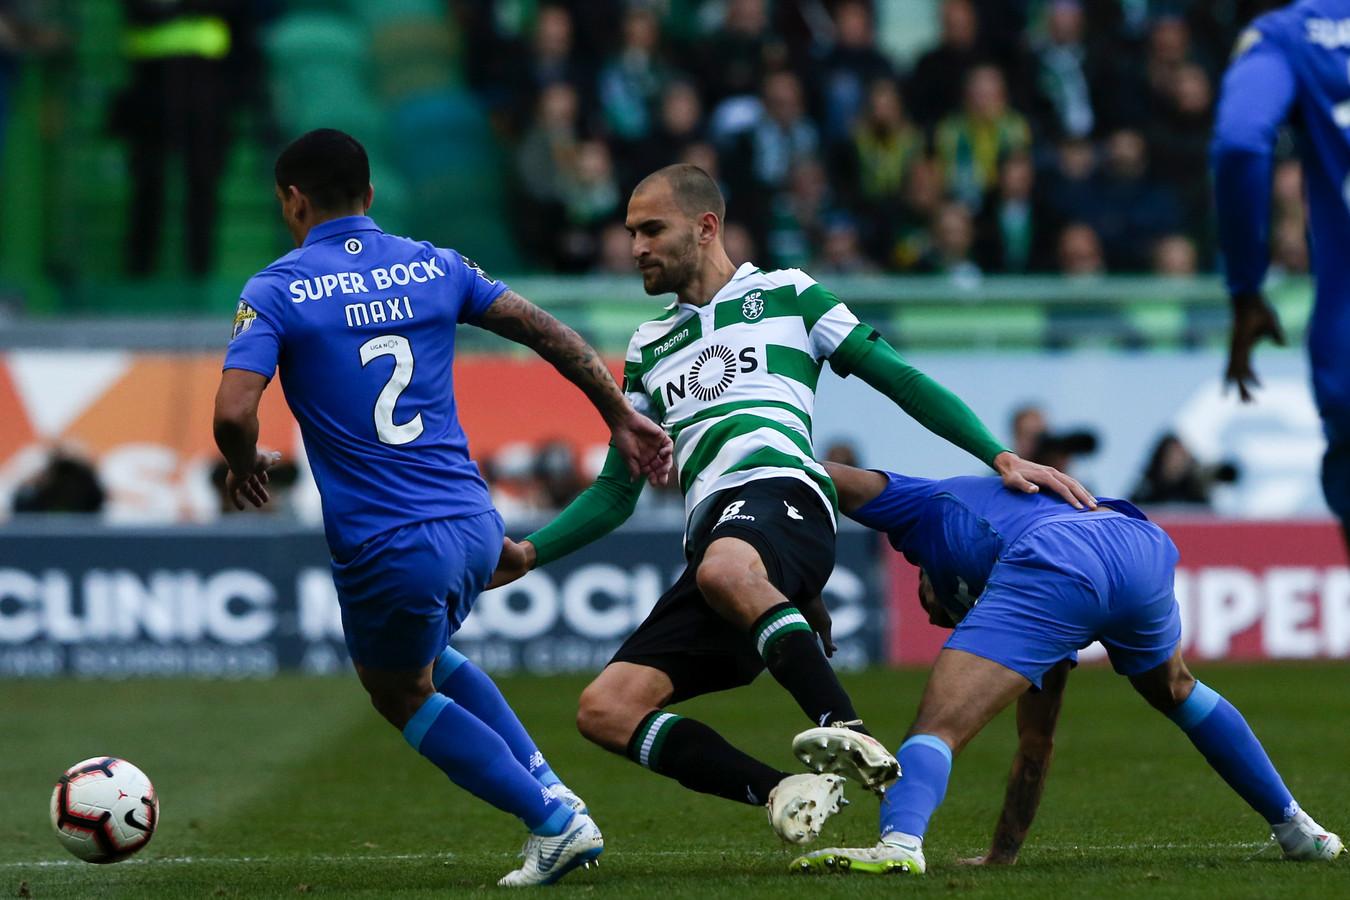 Bas Dost (m) in duel met Maxi Pereira.